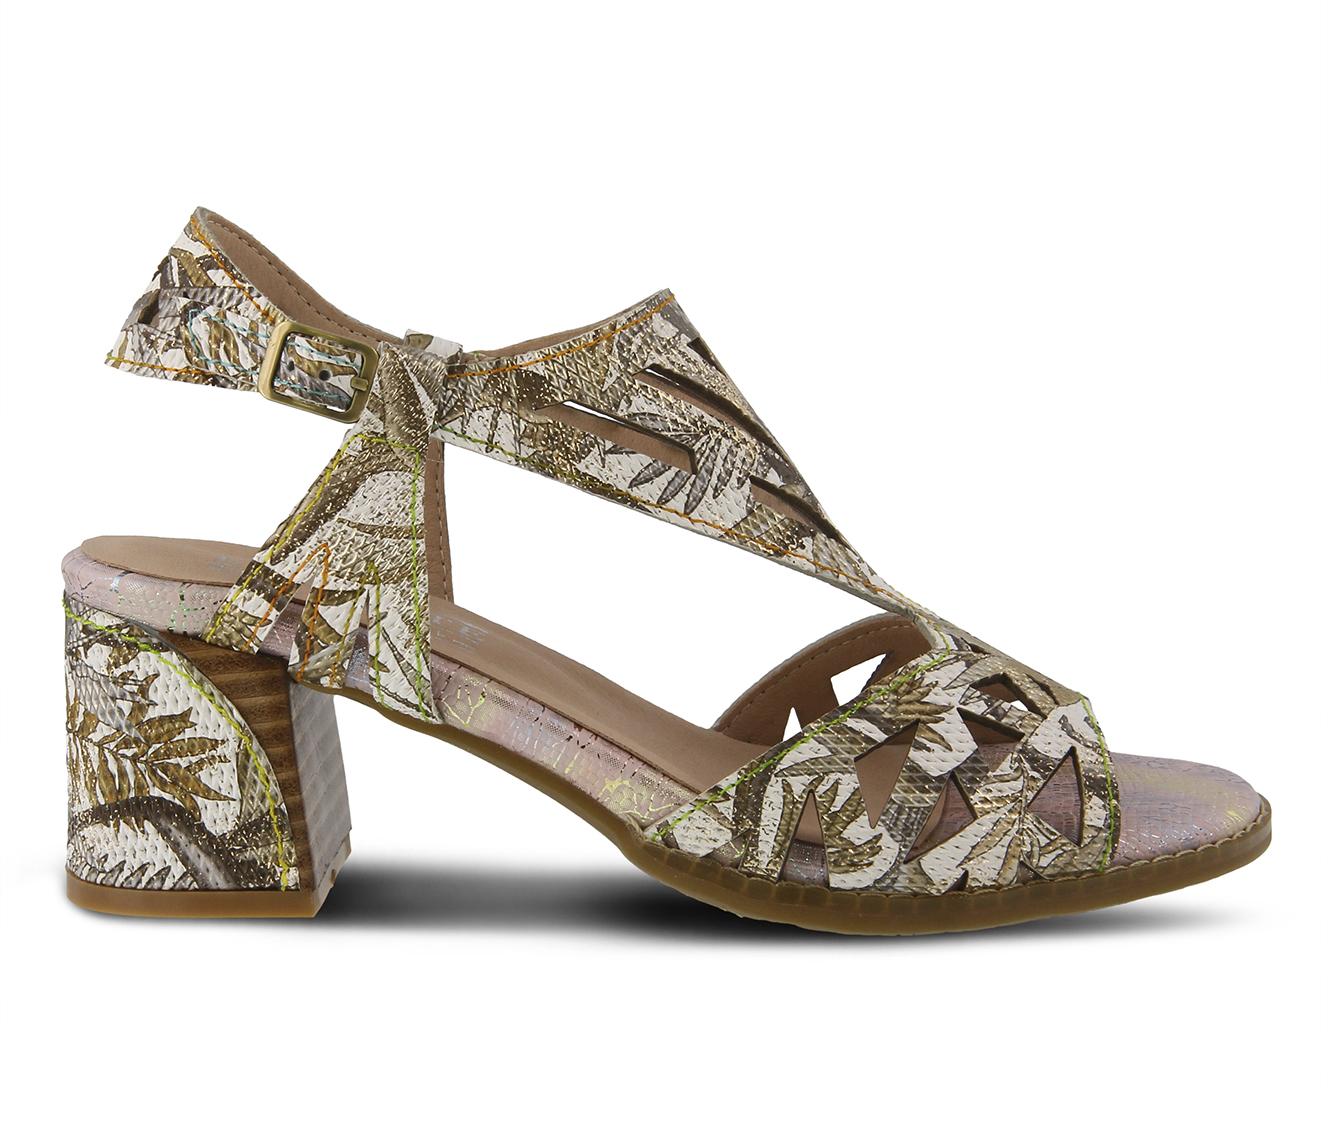 L'Artiste Calpie Women's Dress Shoe (Gold Leather)